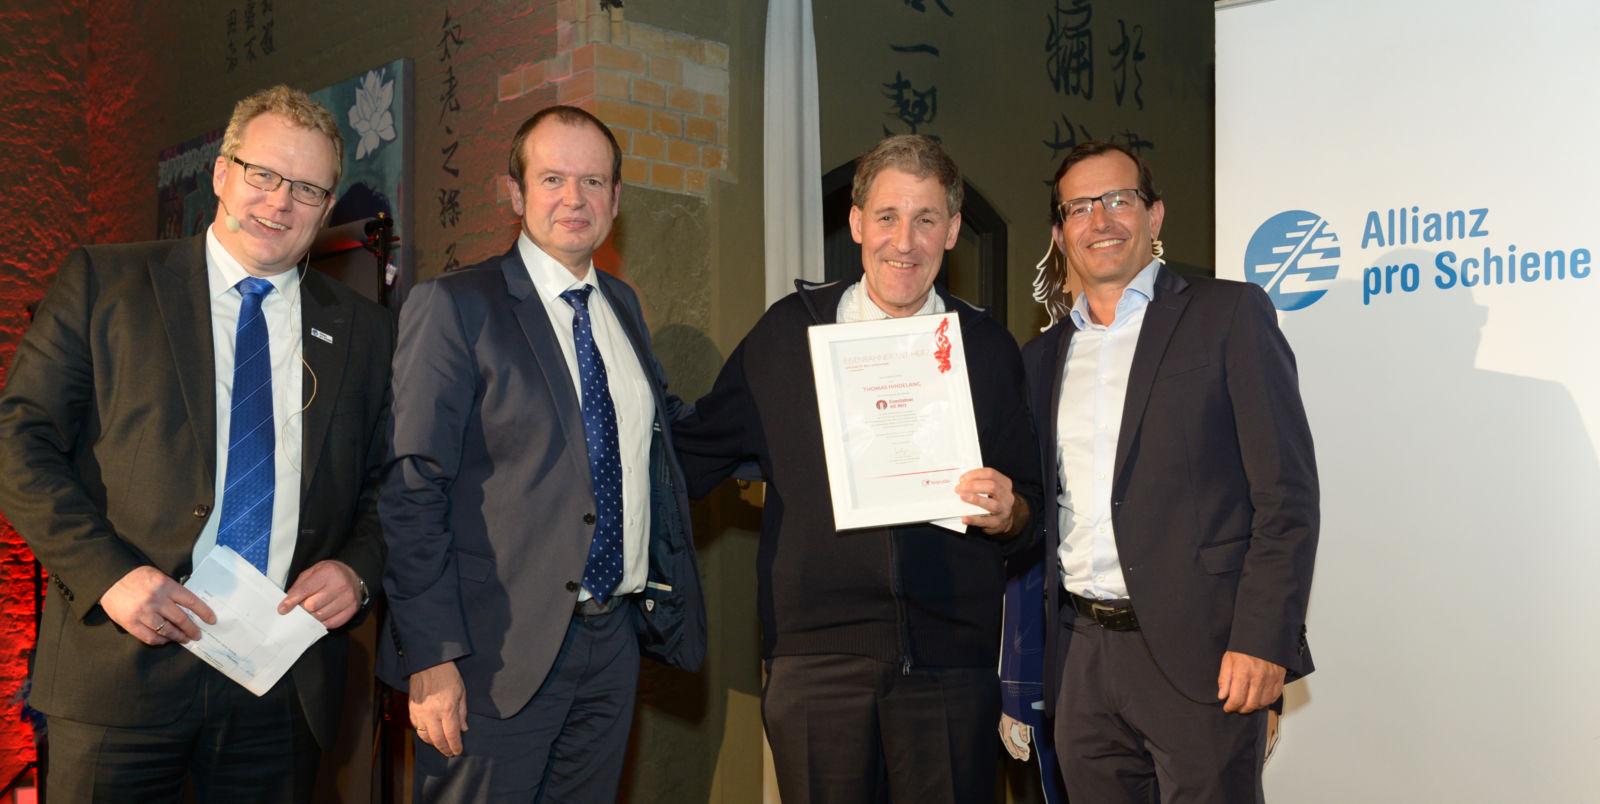 Dirk Flege, Ralf Poppinghuys (Transdev), Preisträger Thomas Hindelang und Christian Schreyer (Transdev)